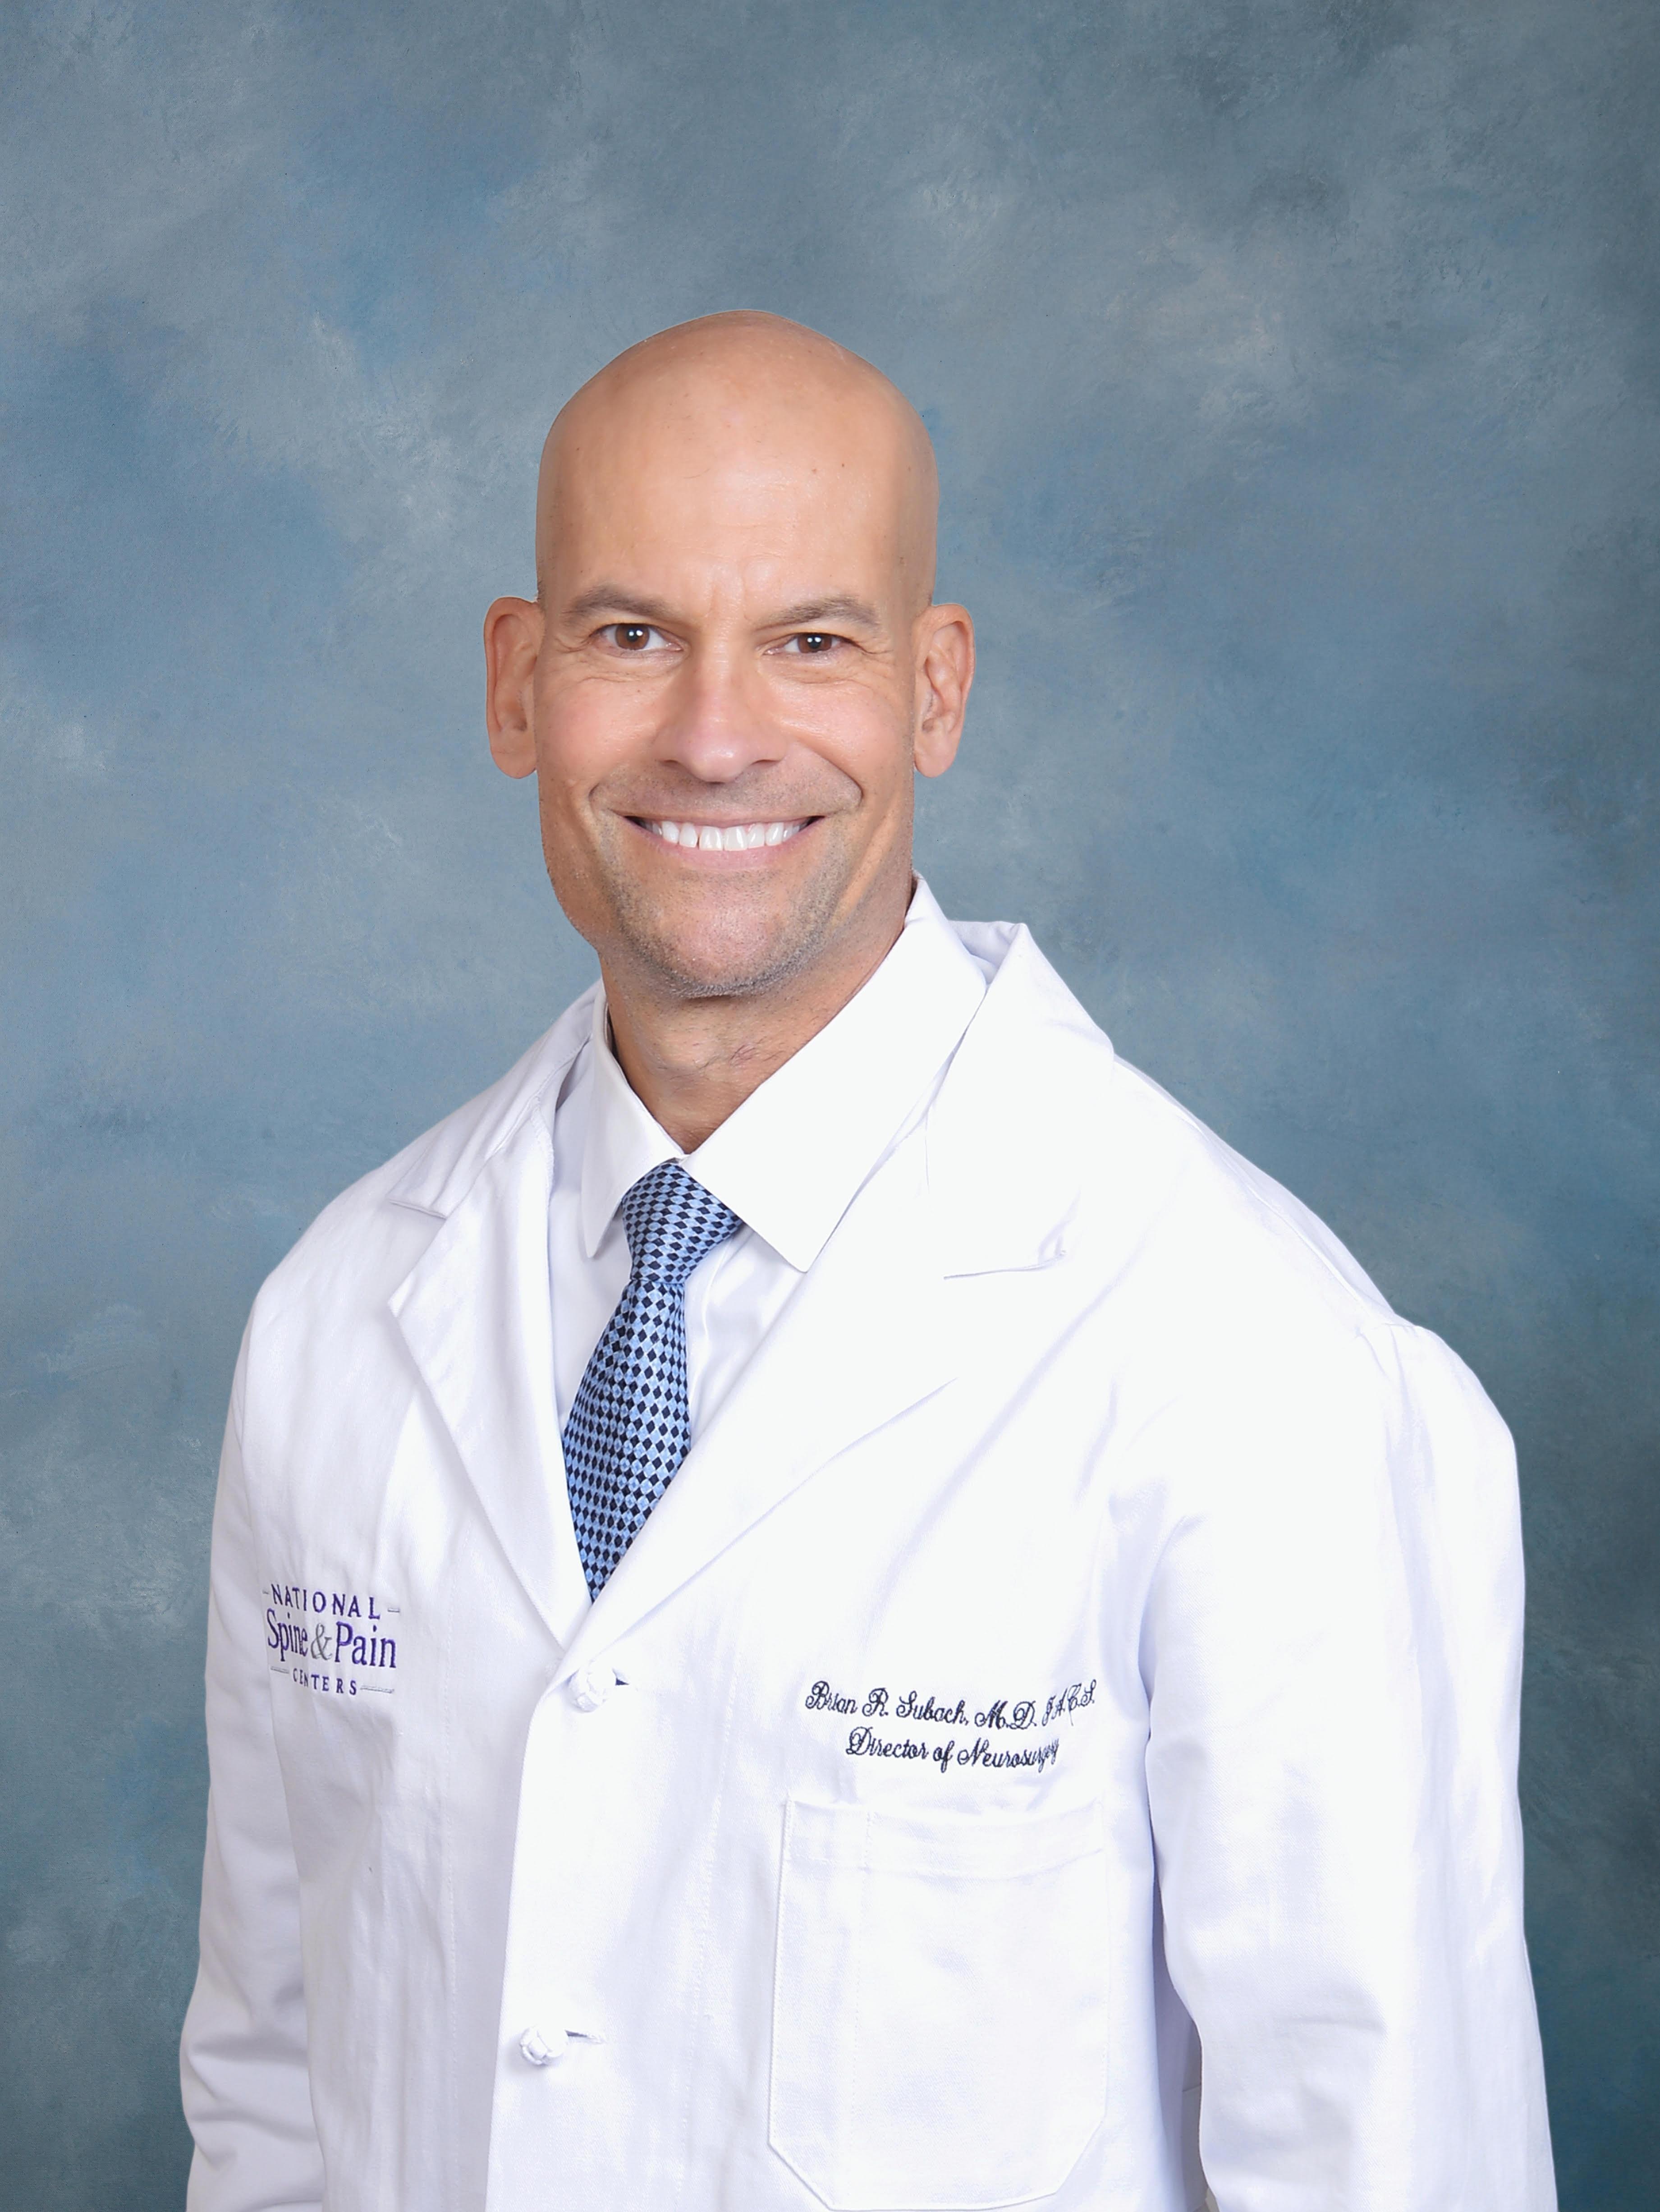 Brian R Subach, M.D., FACS, MD Neurological Surgery (Board Certified)